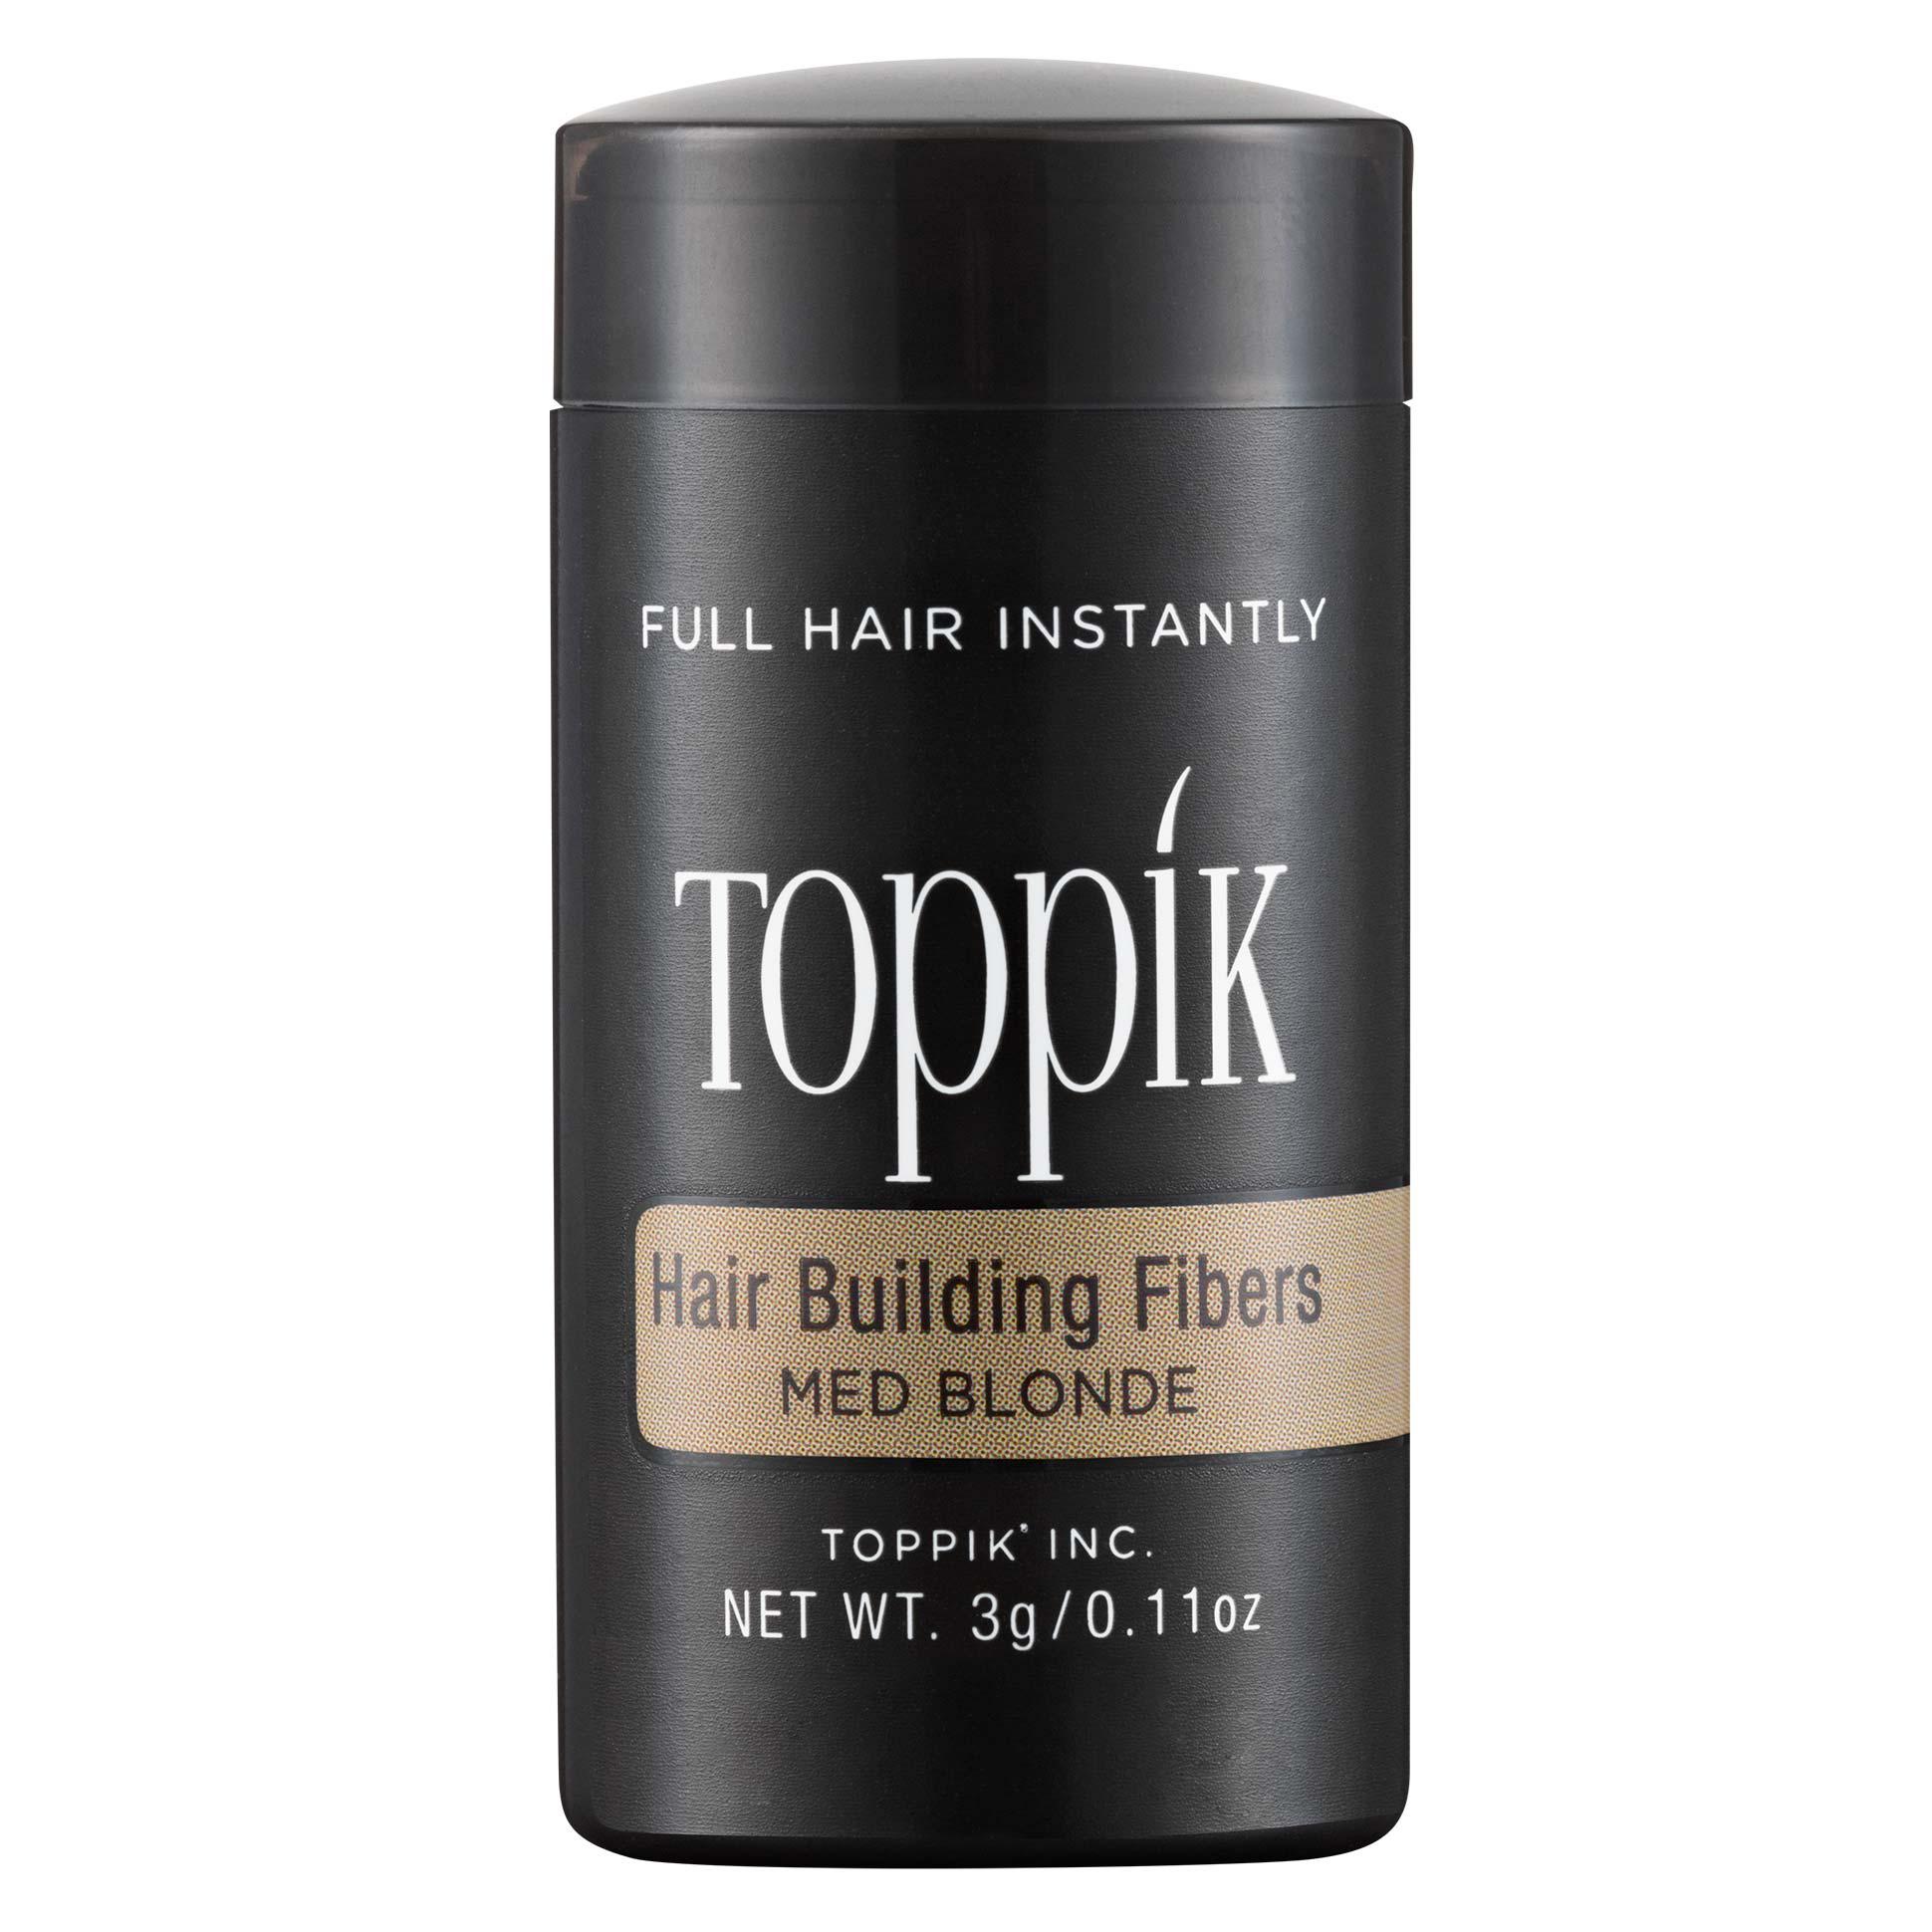 HAIR BUILDING FIBERS - TRAVEL SIZE - MEDIUM BLONDE